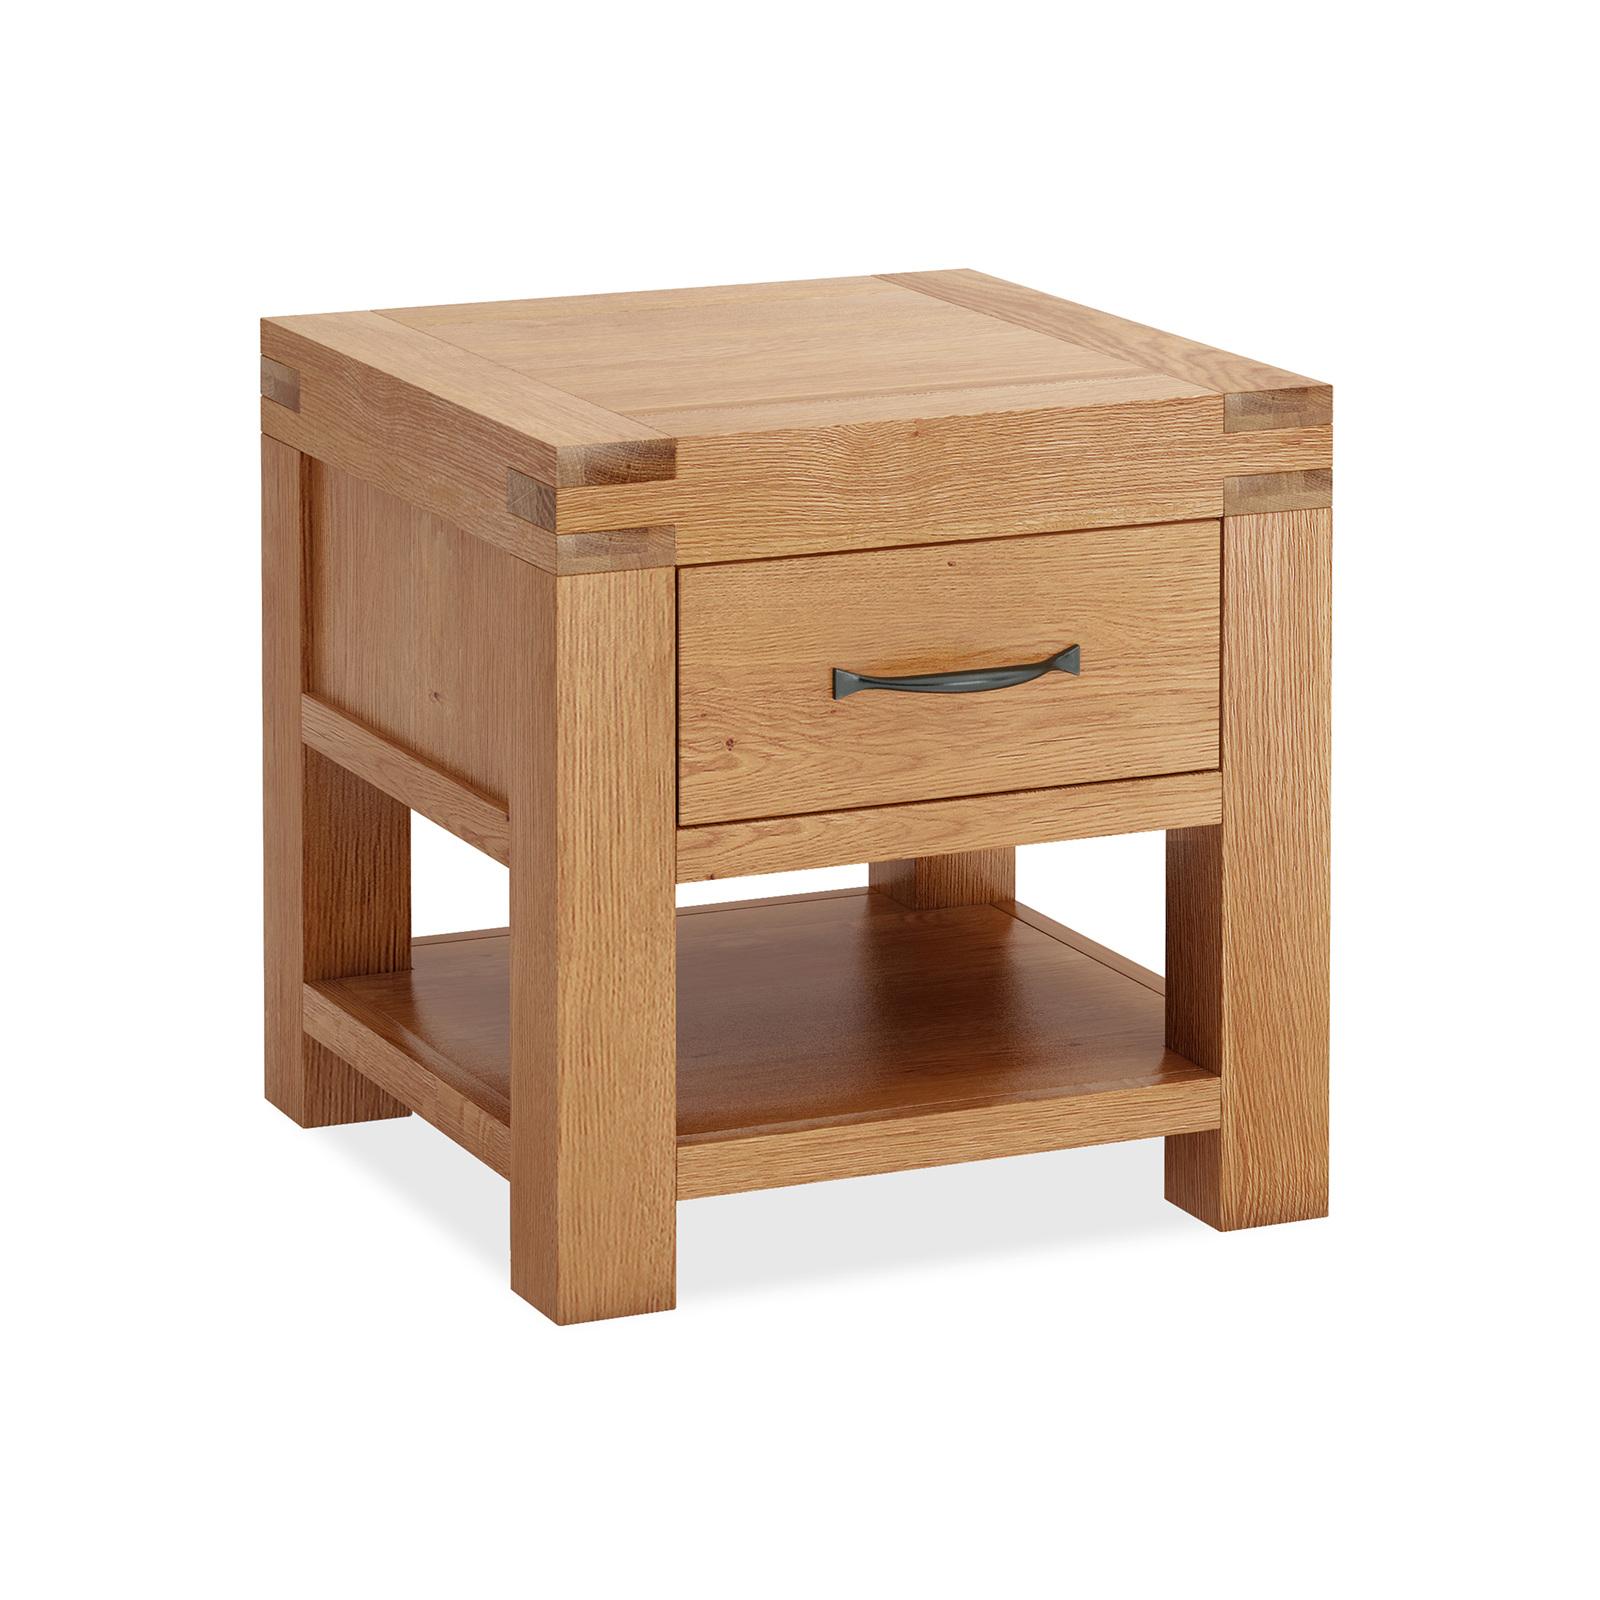 SHERWOOD OAK LAMP TABLE The BEST Furniture Shop